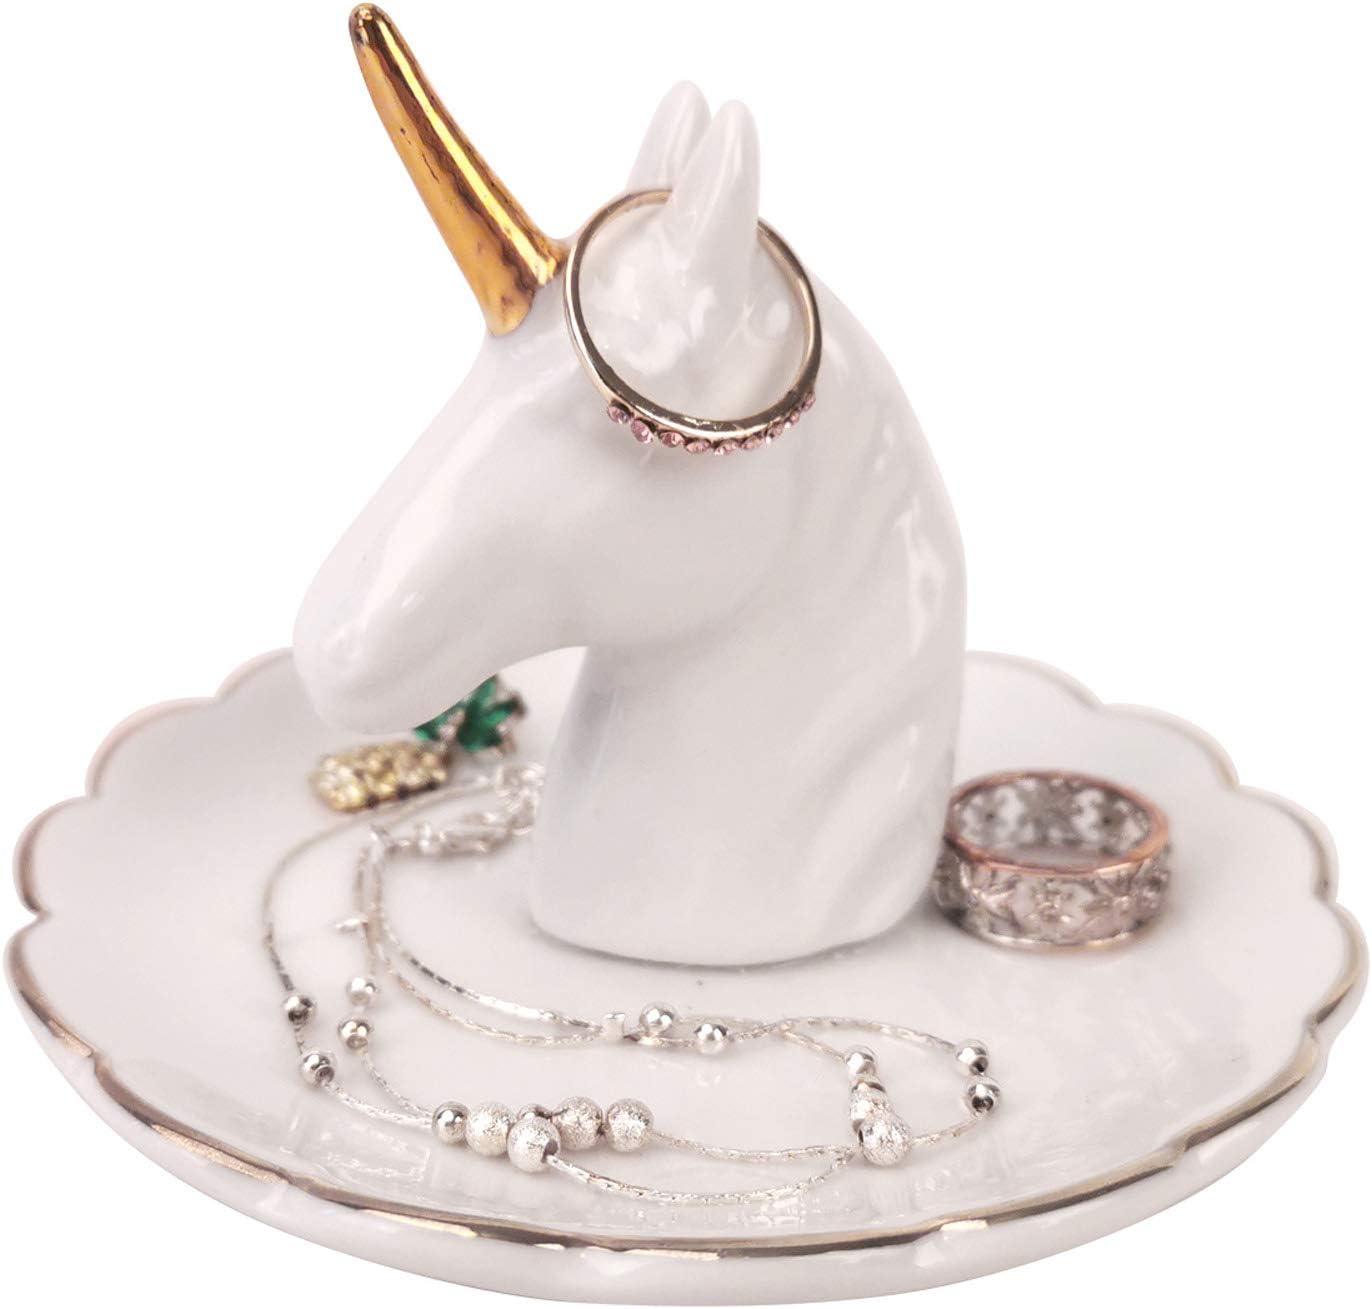 AUTOARK Unicorn Ring Great interest El Paso Mall Holder Desktop Display Tray Jewelry